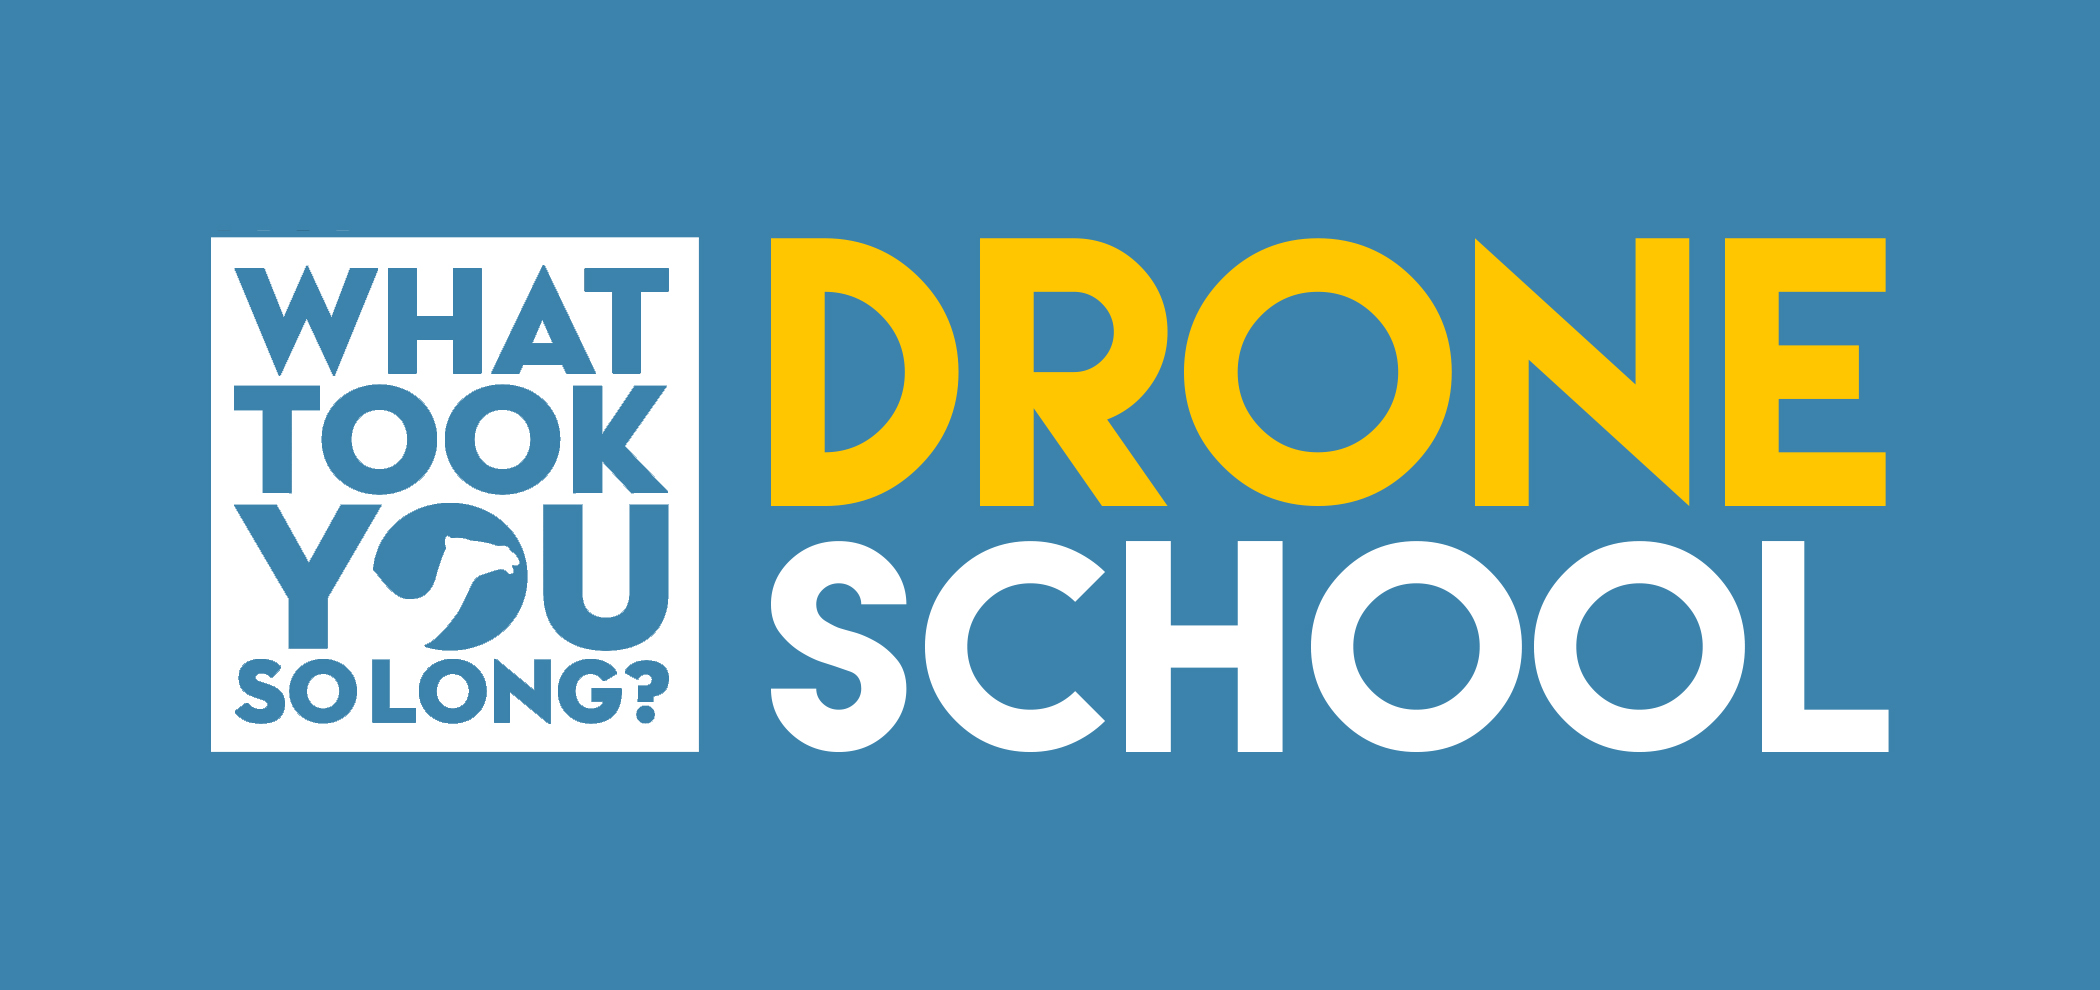 WTYSL_drone_logo4.jpg